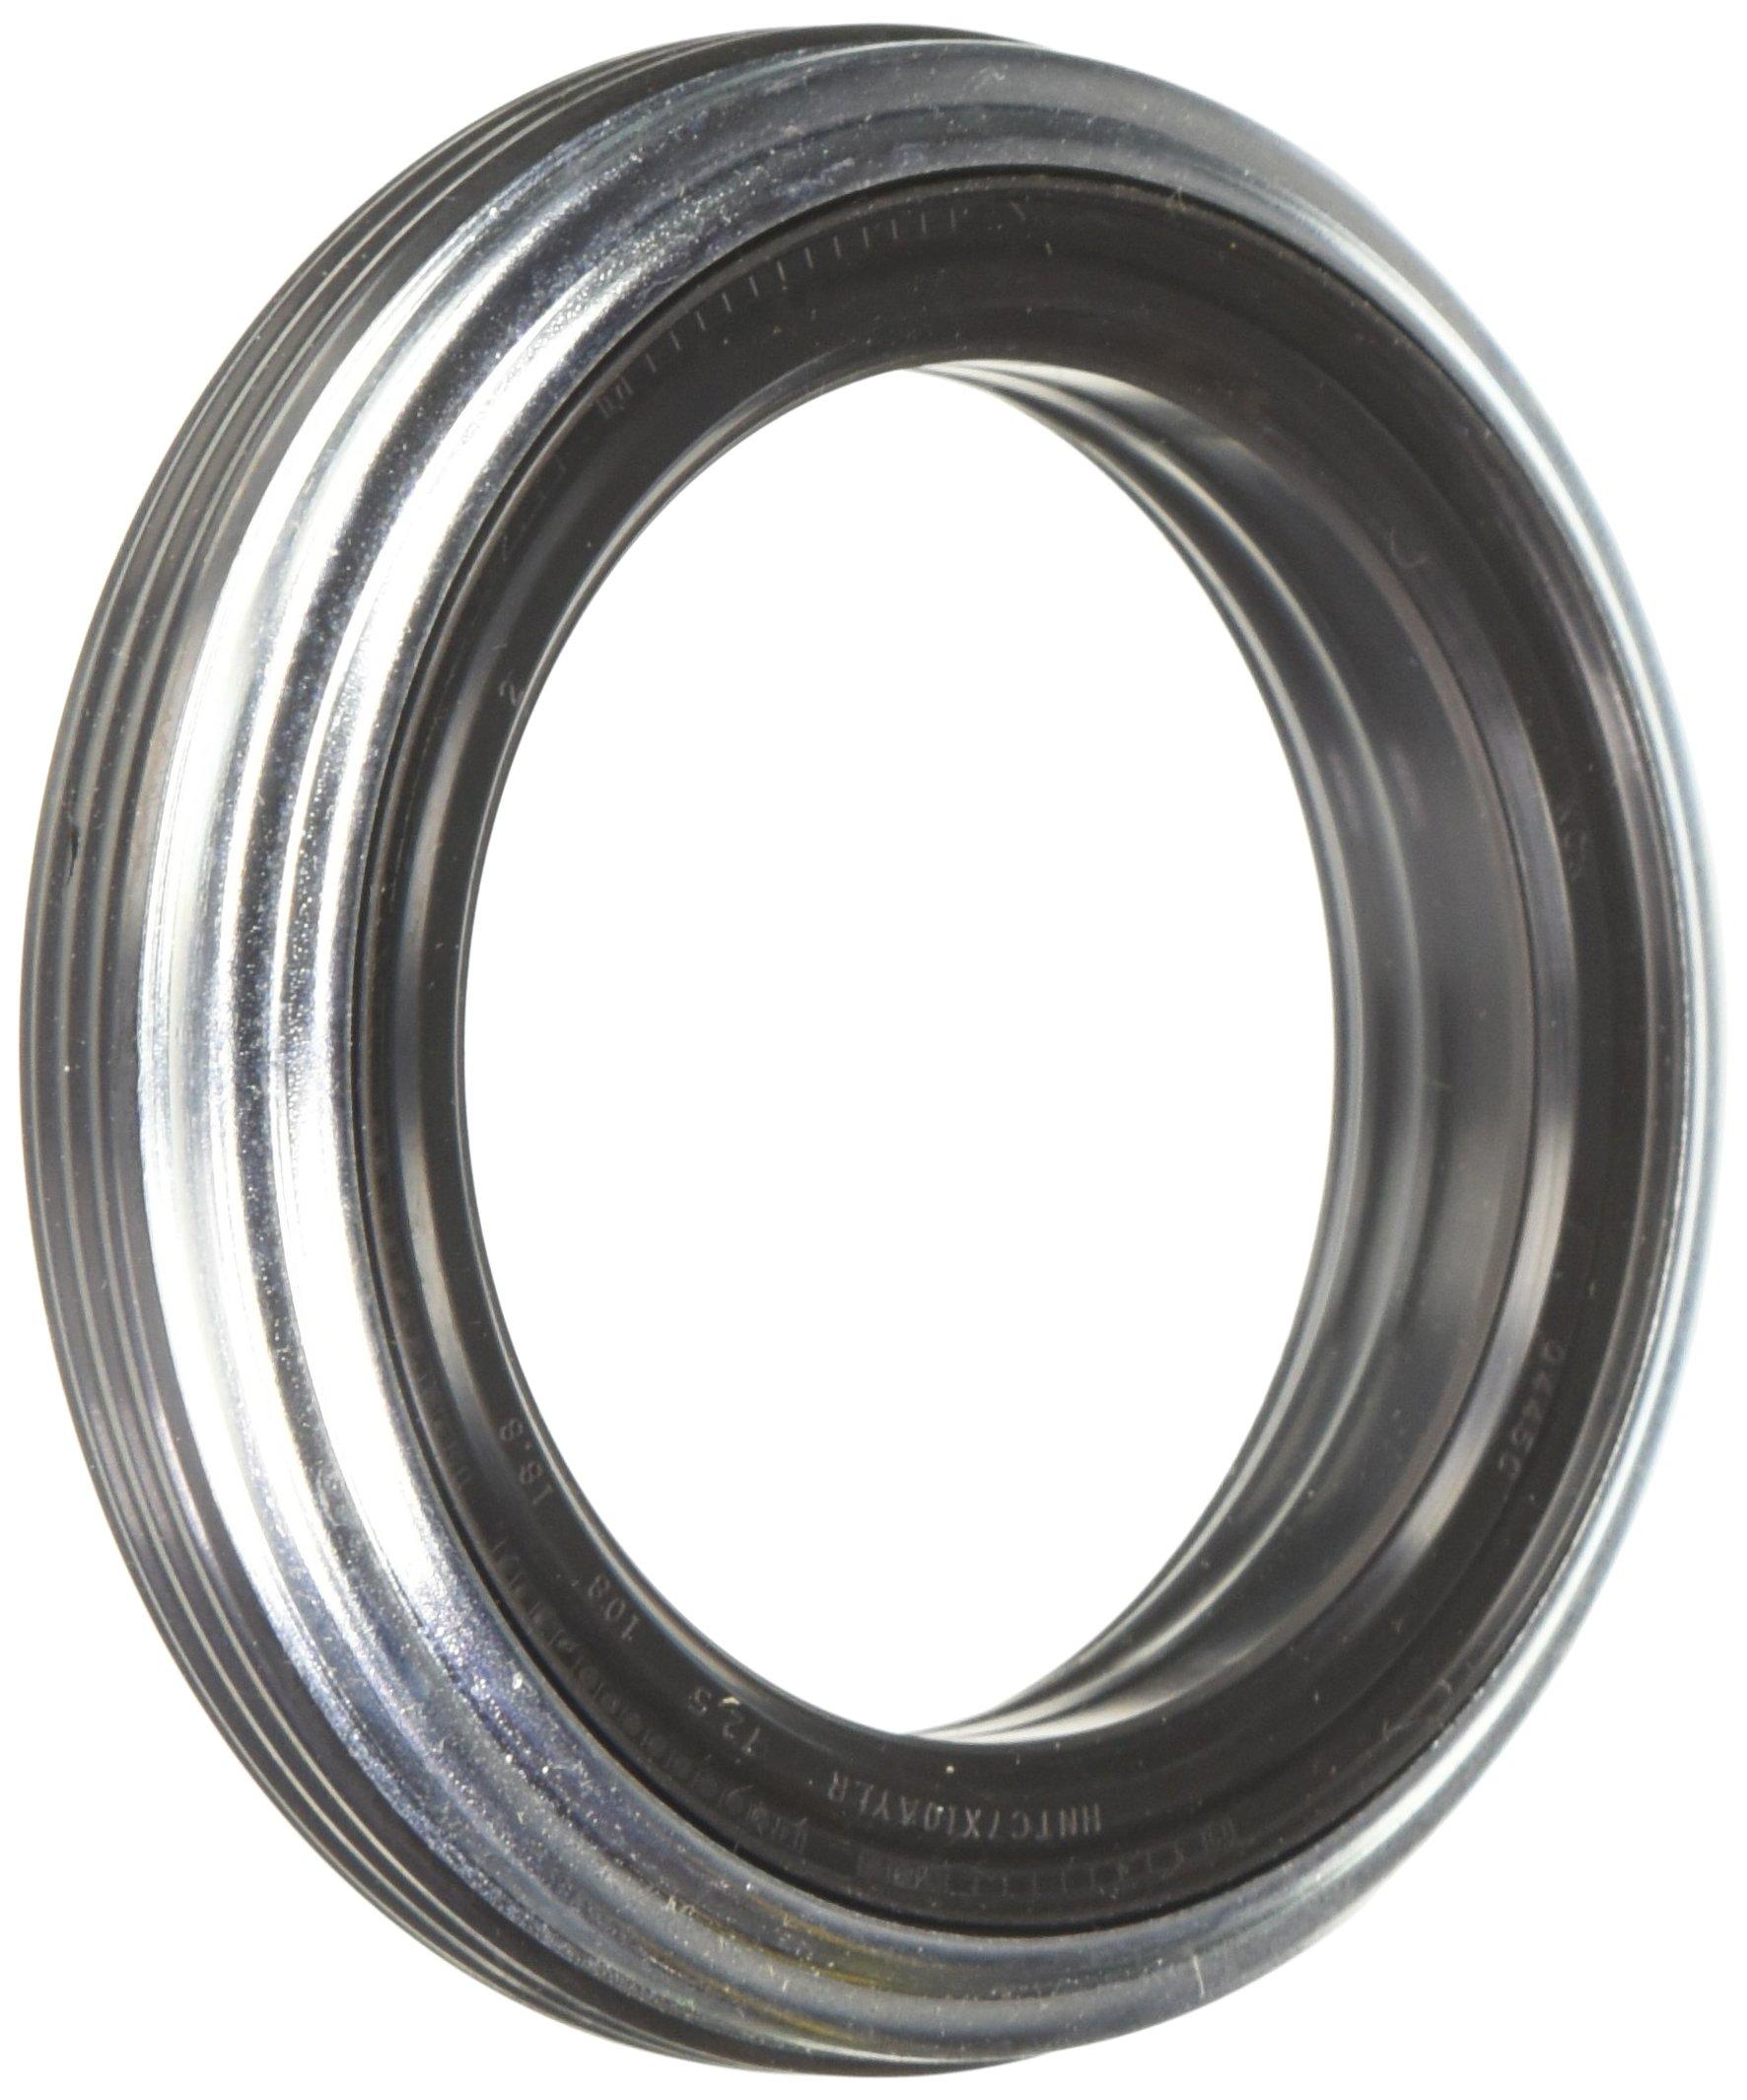 Timken 710563 Rear Wheel Seal